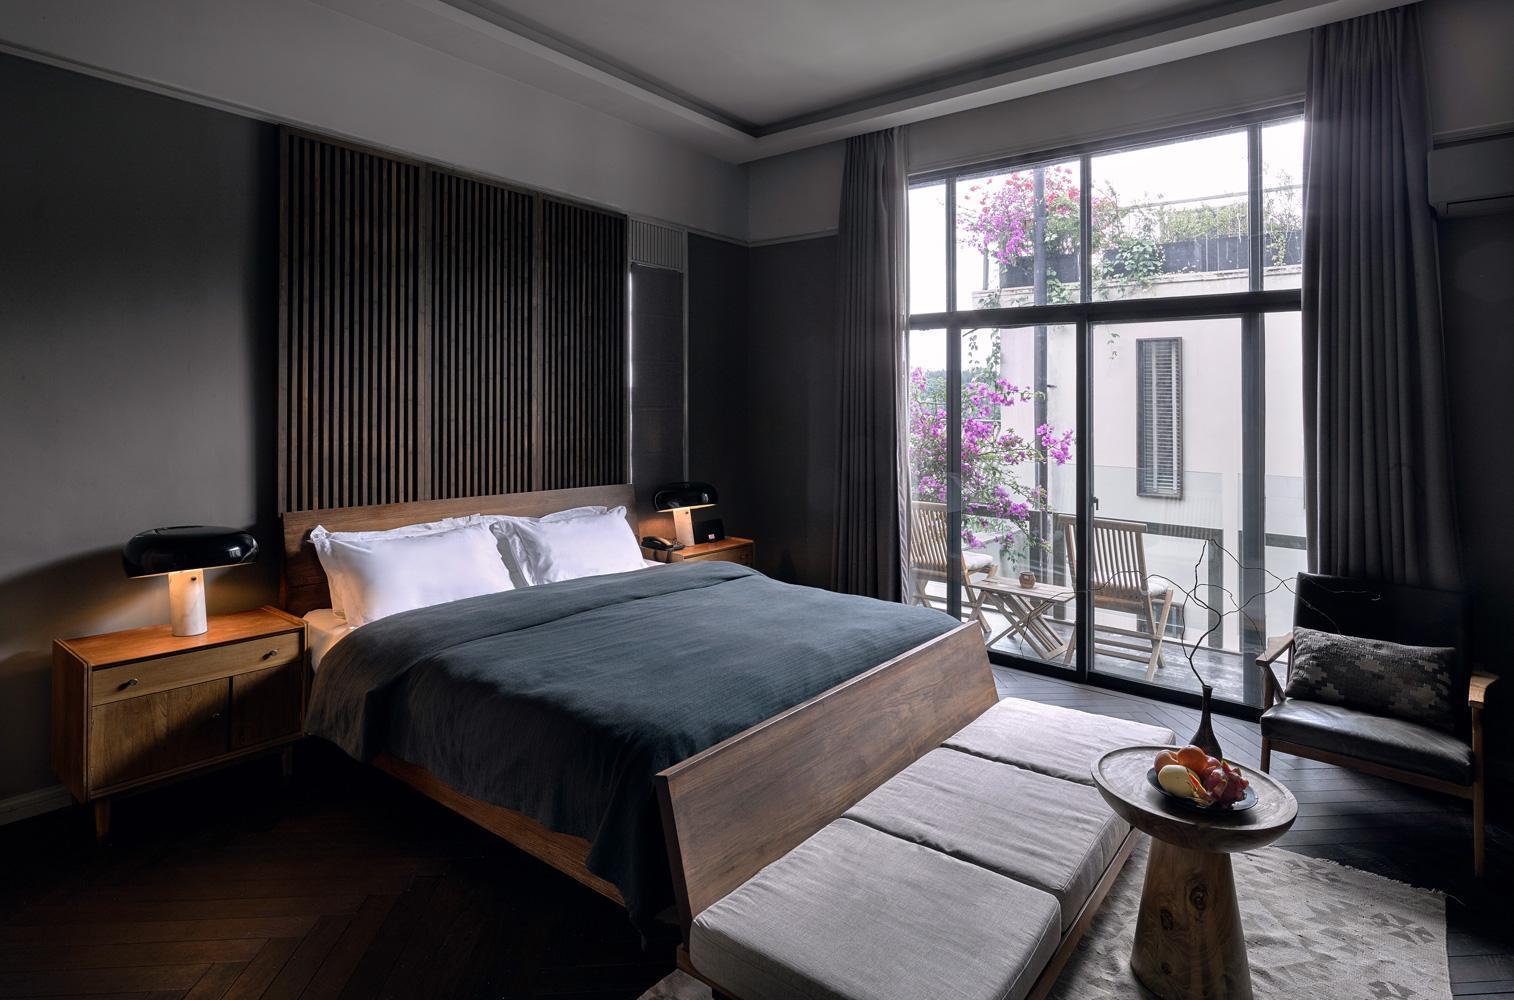 Yakamoz Resort Shuanglang Hai Street Branch Eryuan Dali